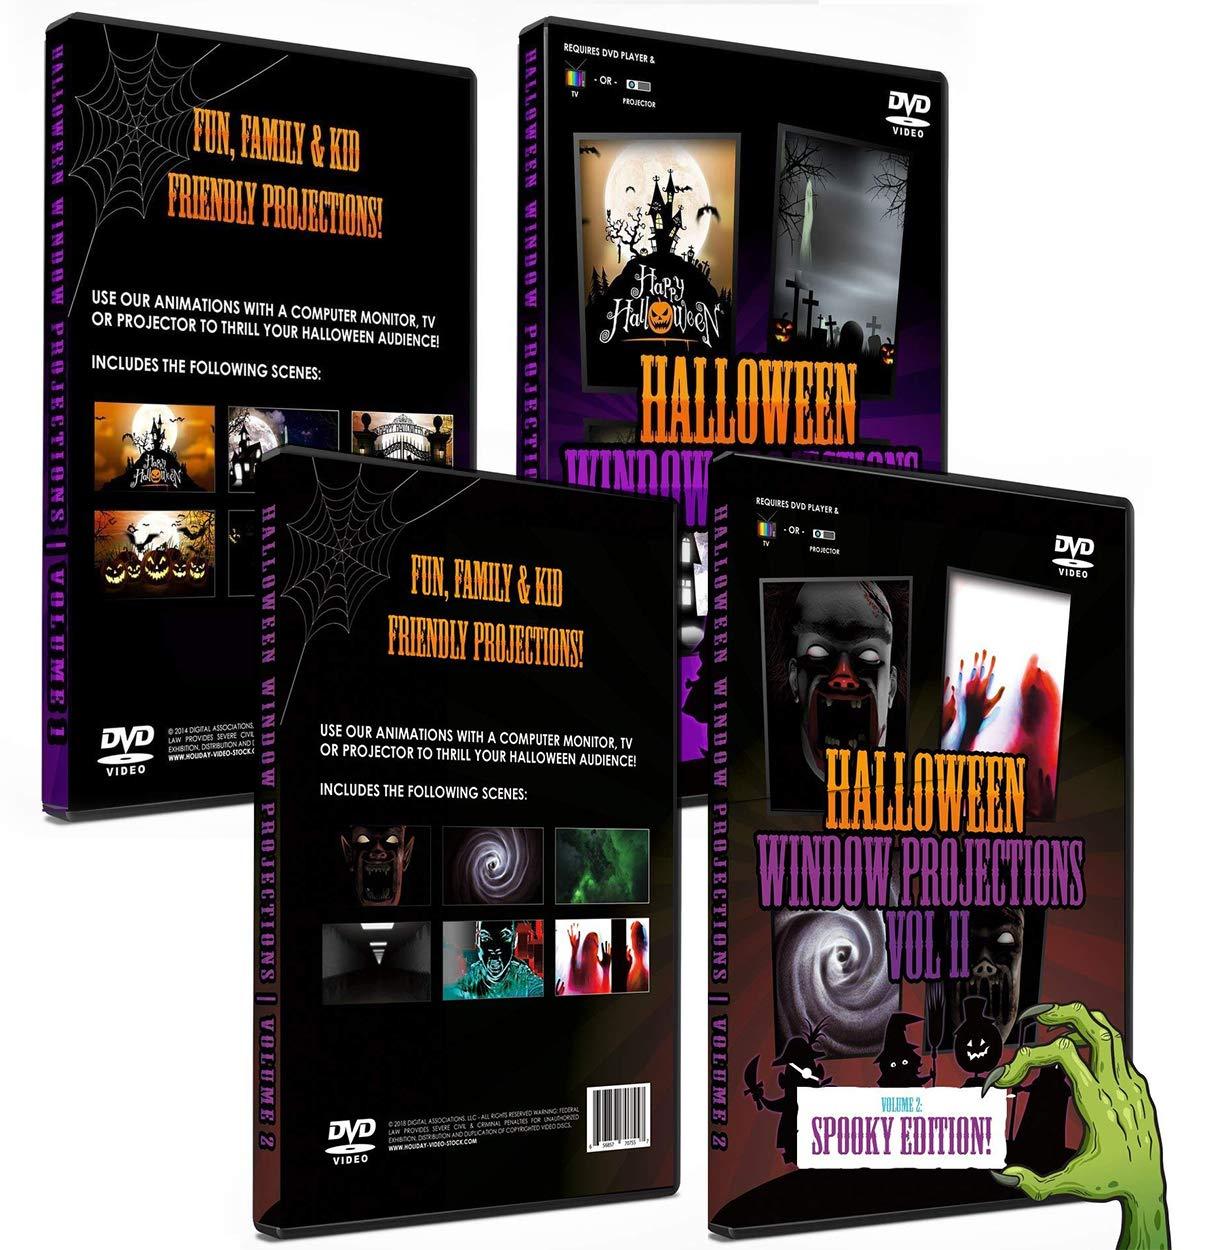 Halloween Dvd Box Set.Amazon Com 2 Dvd Box Set Halloween Digital Window Decoration Vol